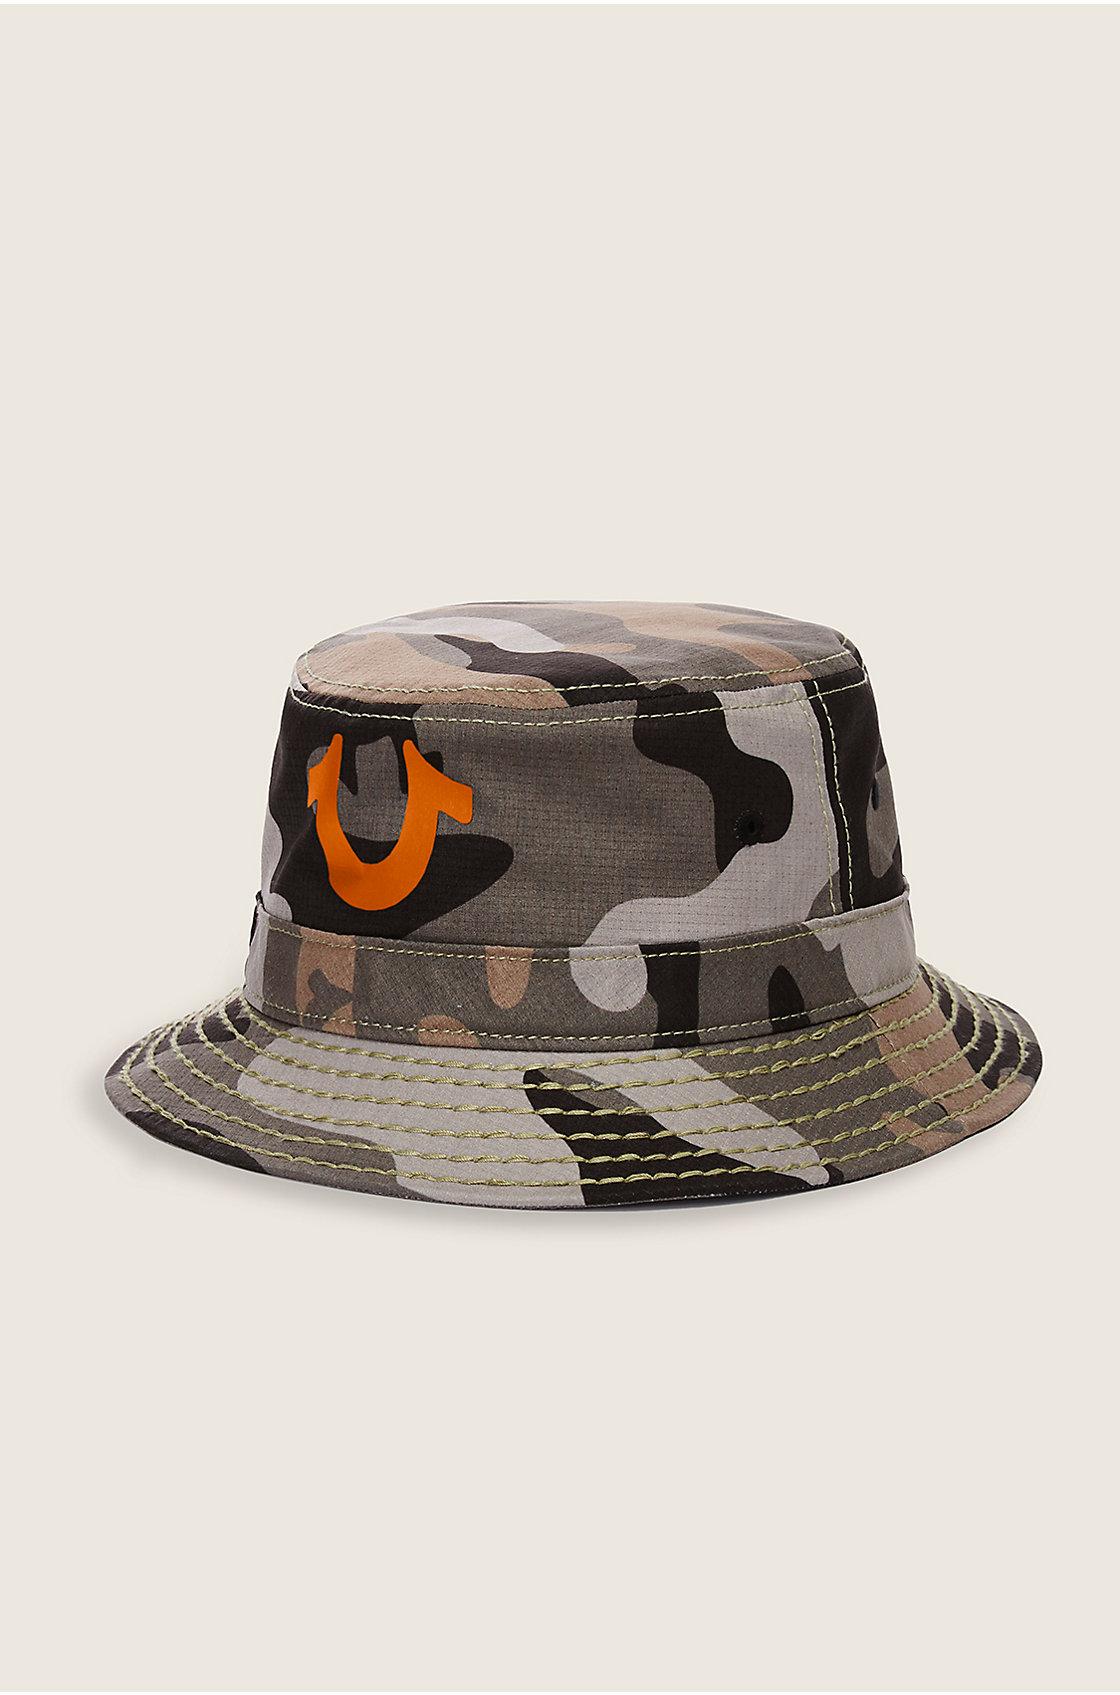 ce0a5b5b True Religion Tr Camo Bucket Hat for Men - Lyst